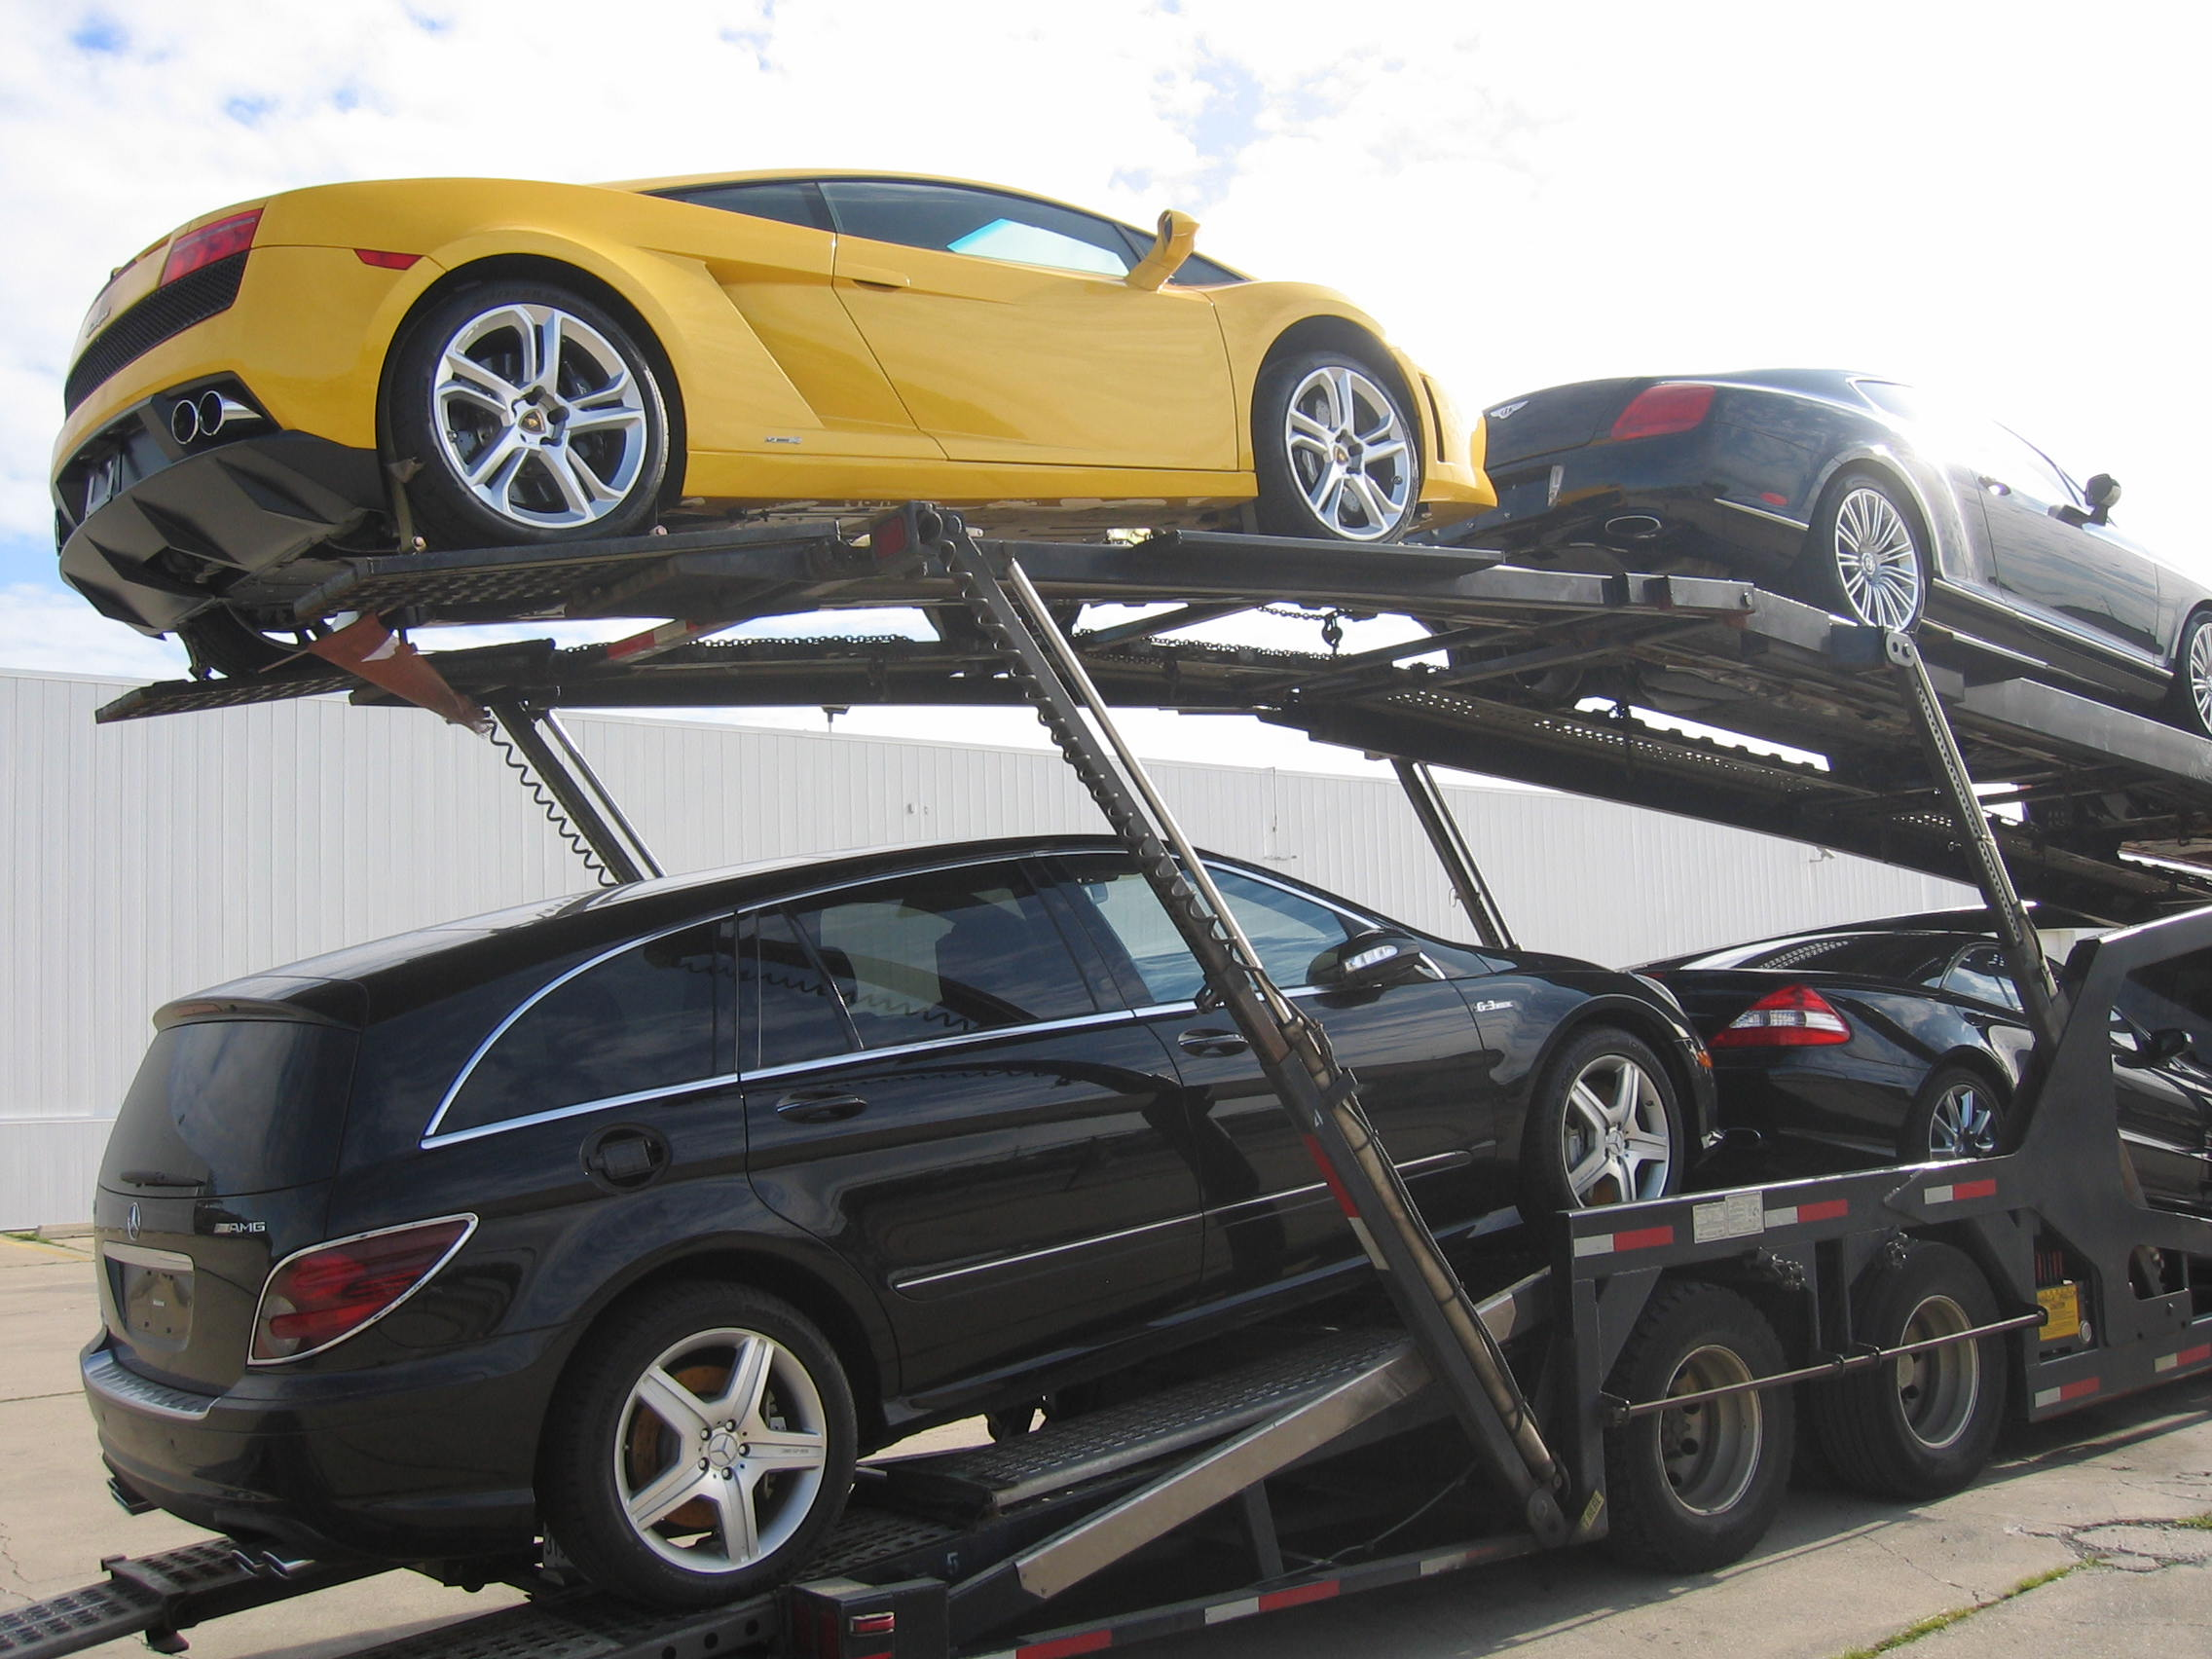 Ernies Auto Sales >> RoadRunner Auto Transport, Bethpage New York (NY) - LocalDatabase.com